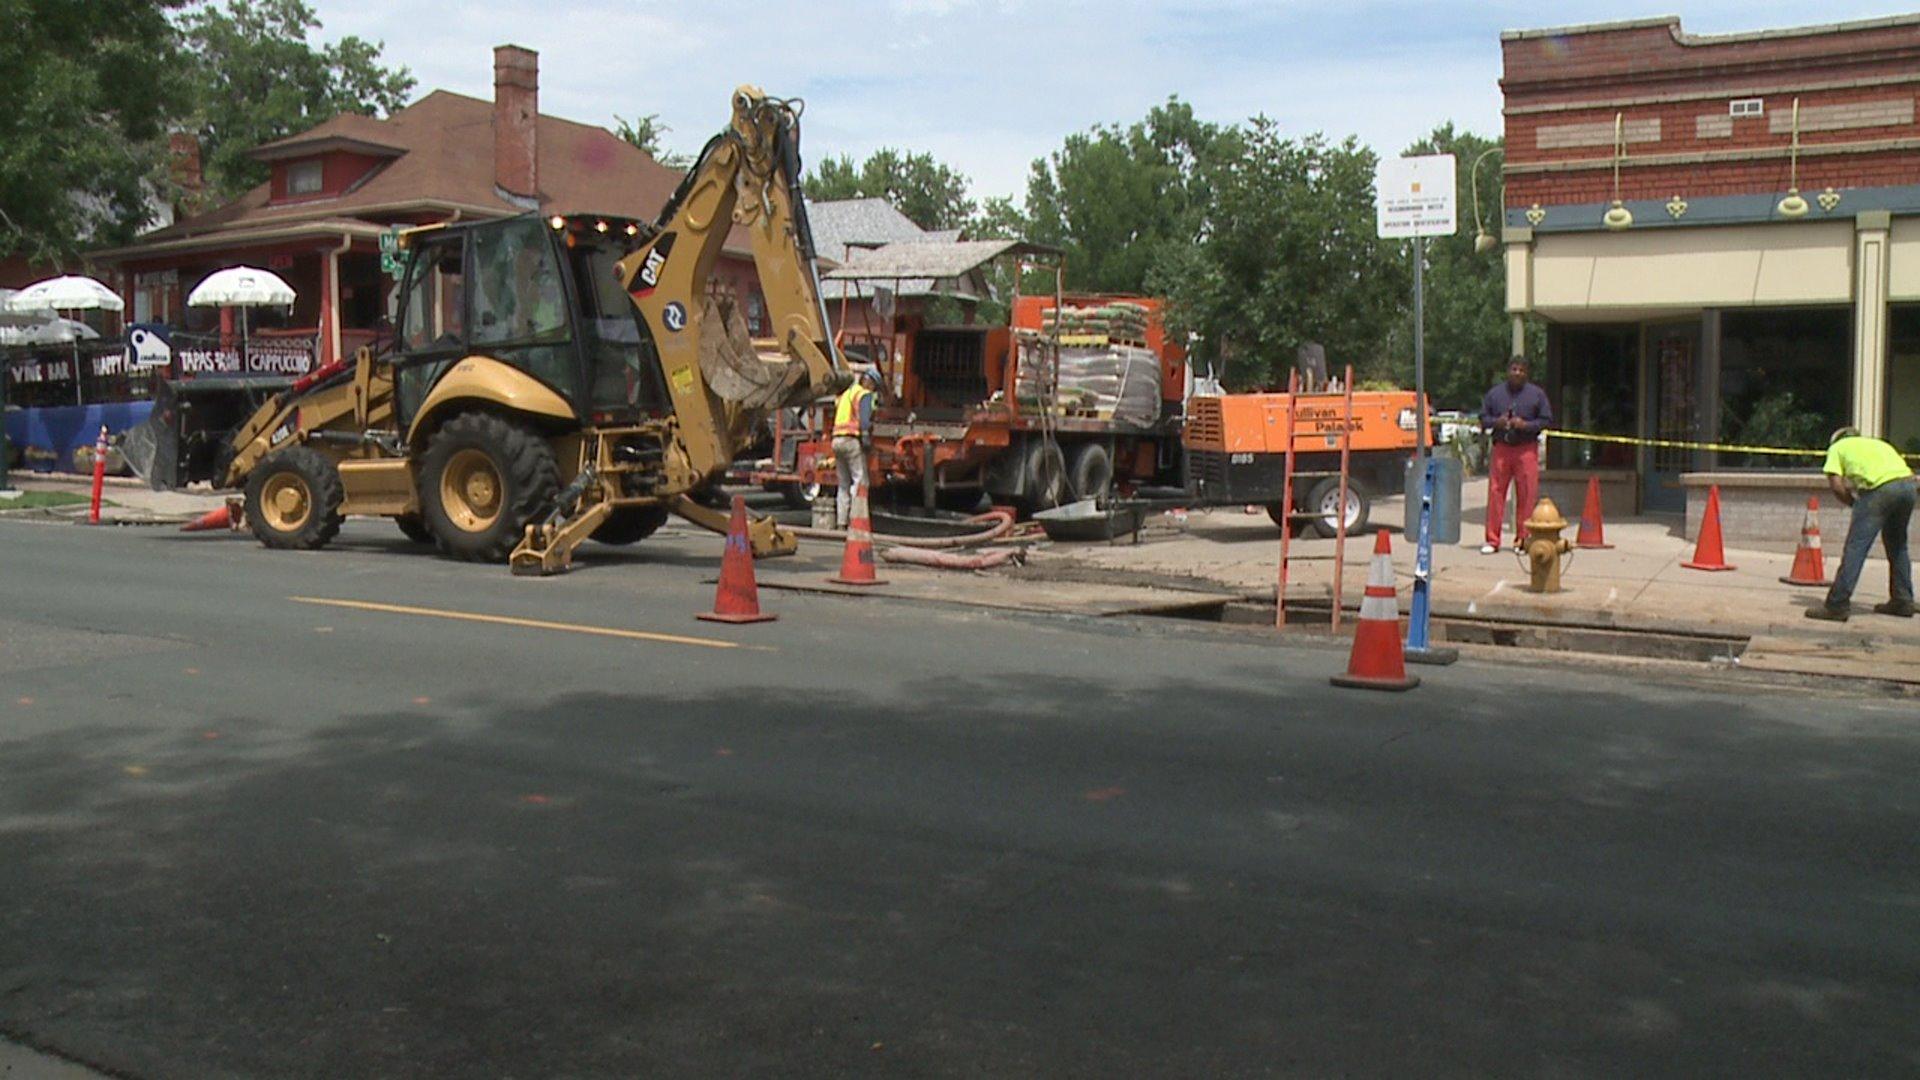 Water pipe work in Denver's West Highlands neighborhood